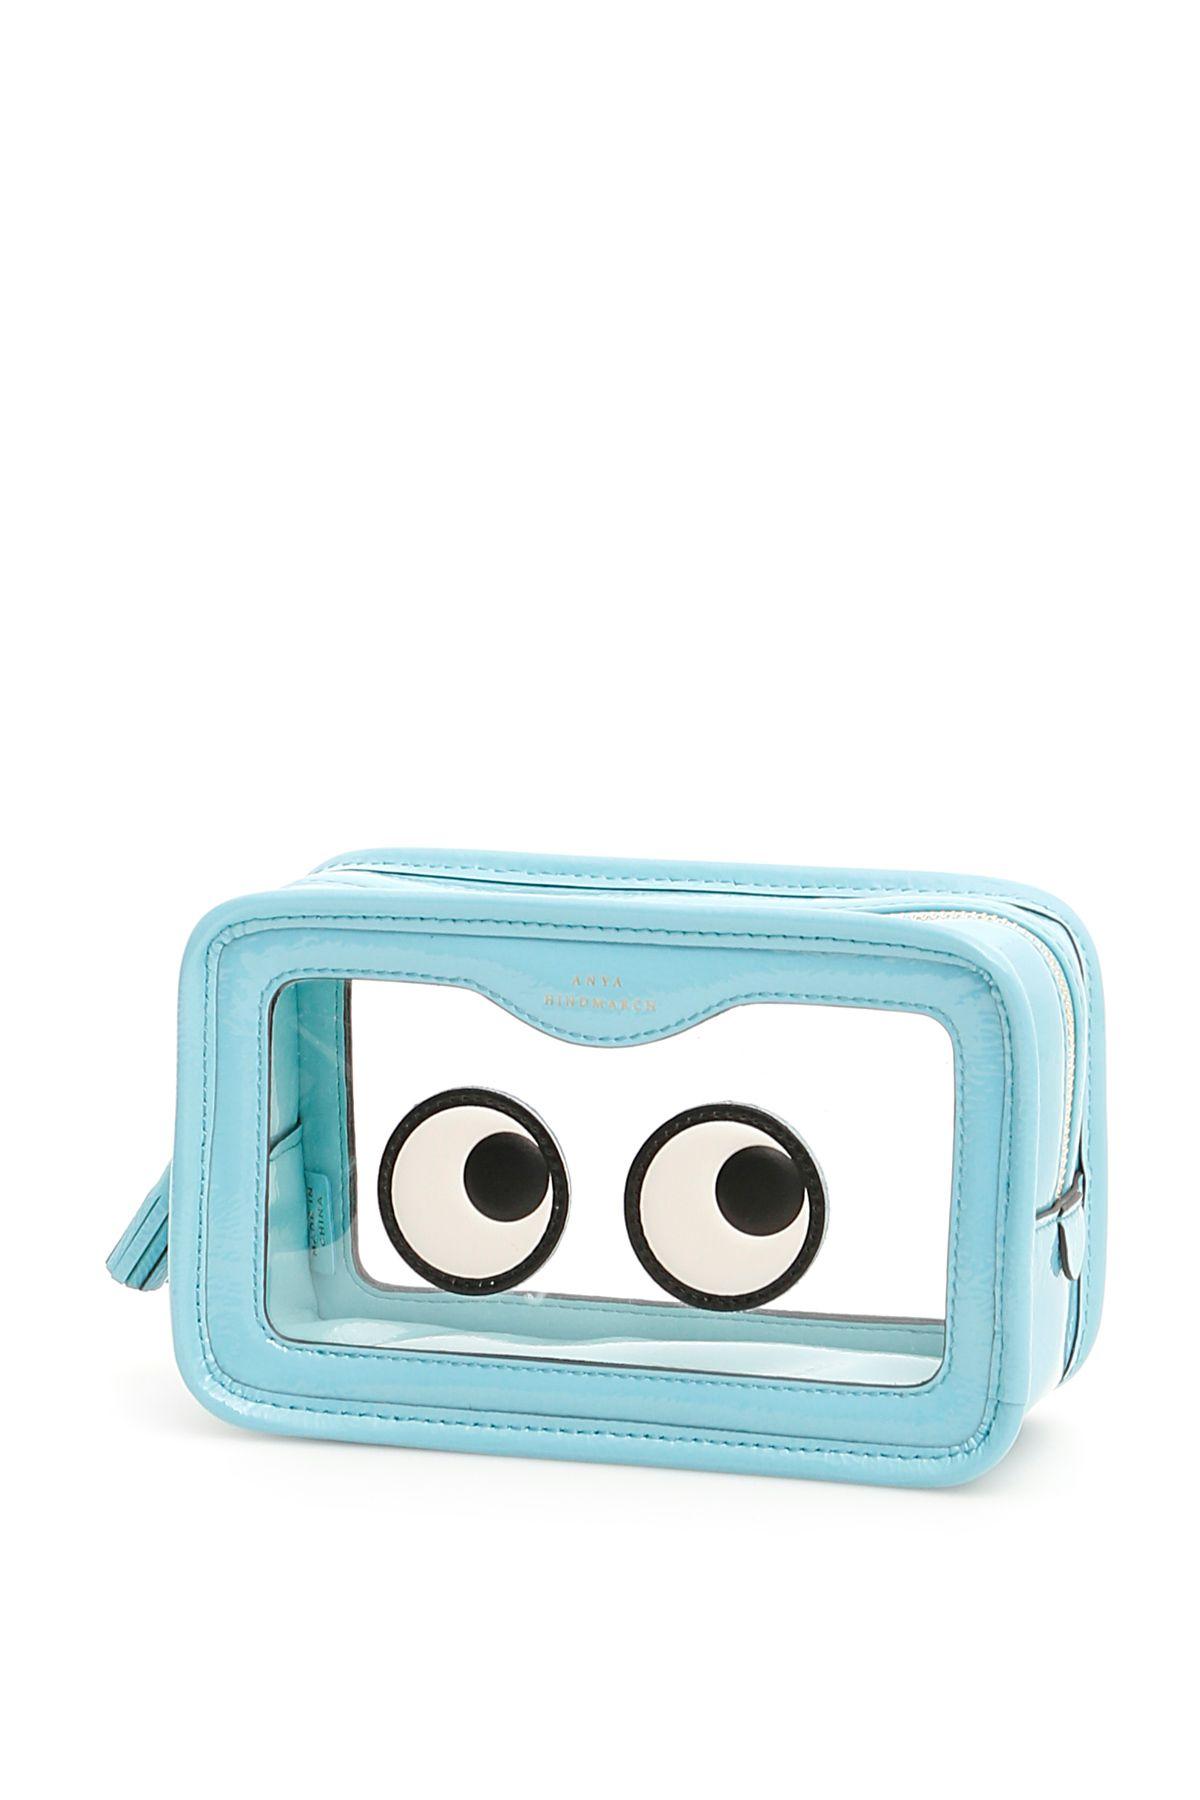 Rainy Day Eyes Make Up Pouch in Aquamarine